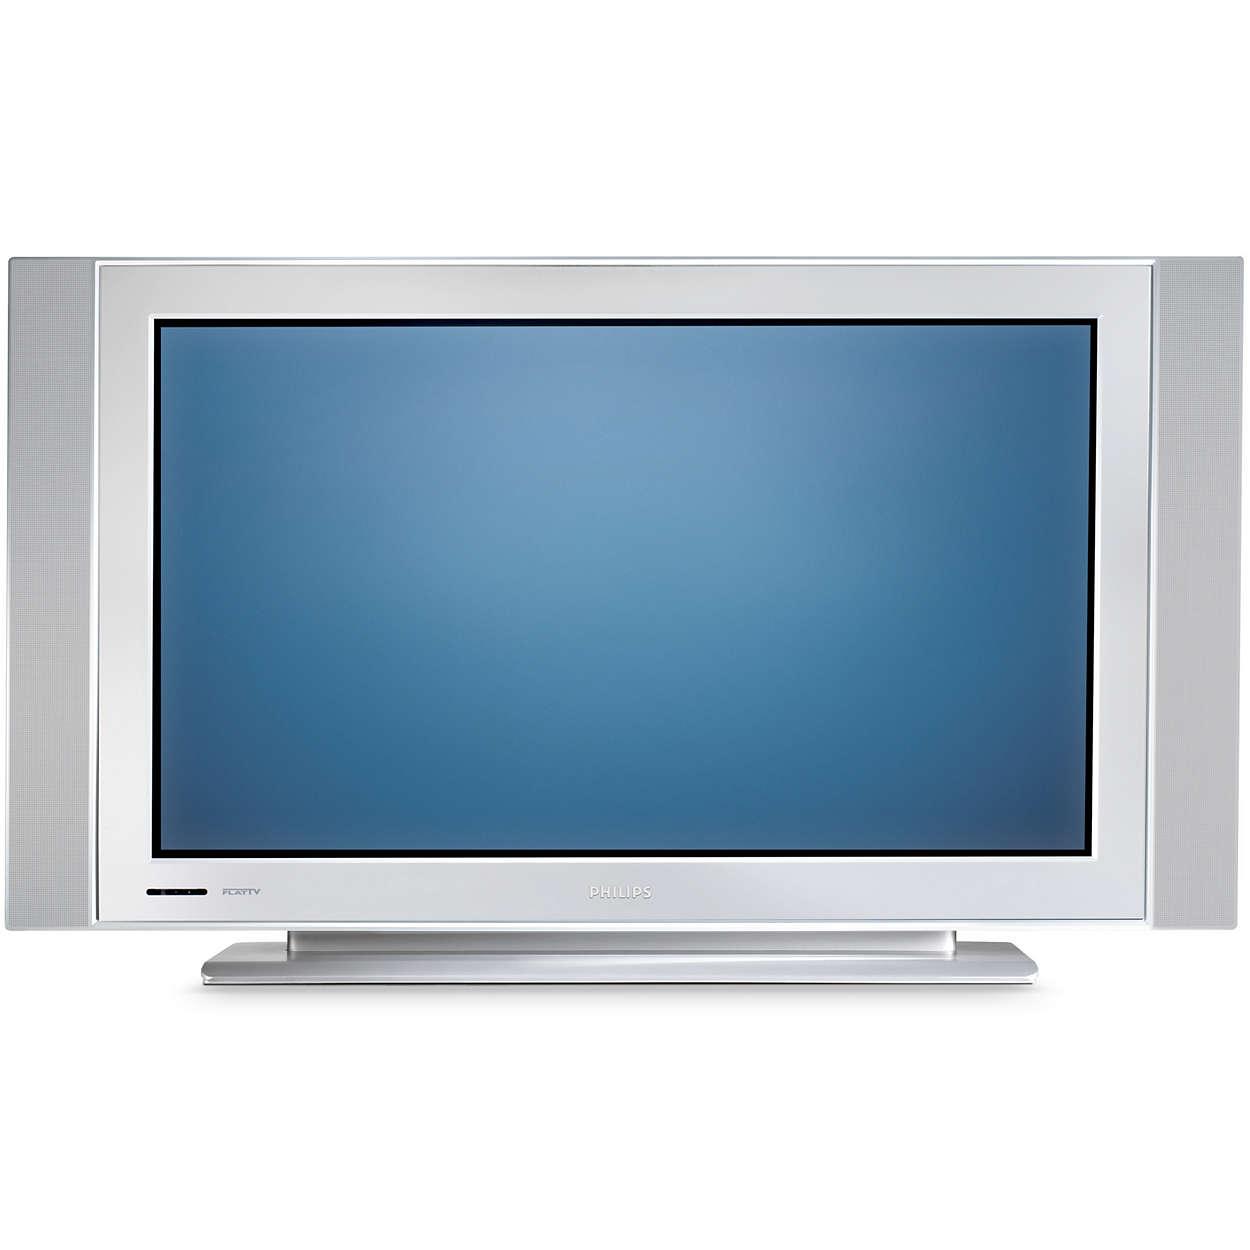 widescreen flat tv 42pf5320 10 philips. Black Bedroom Furniture Sets. Home Design Ideas